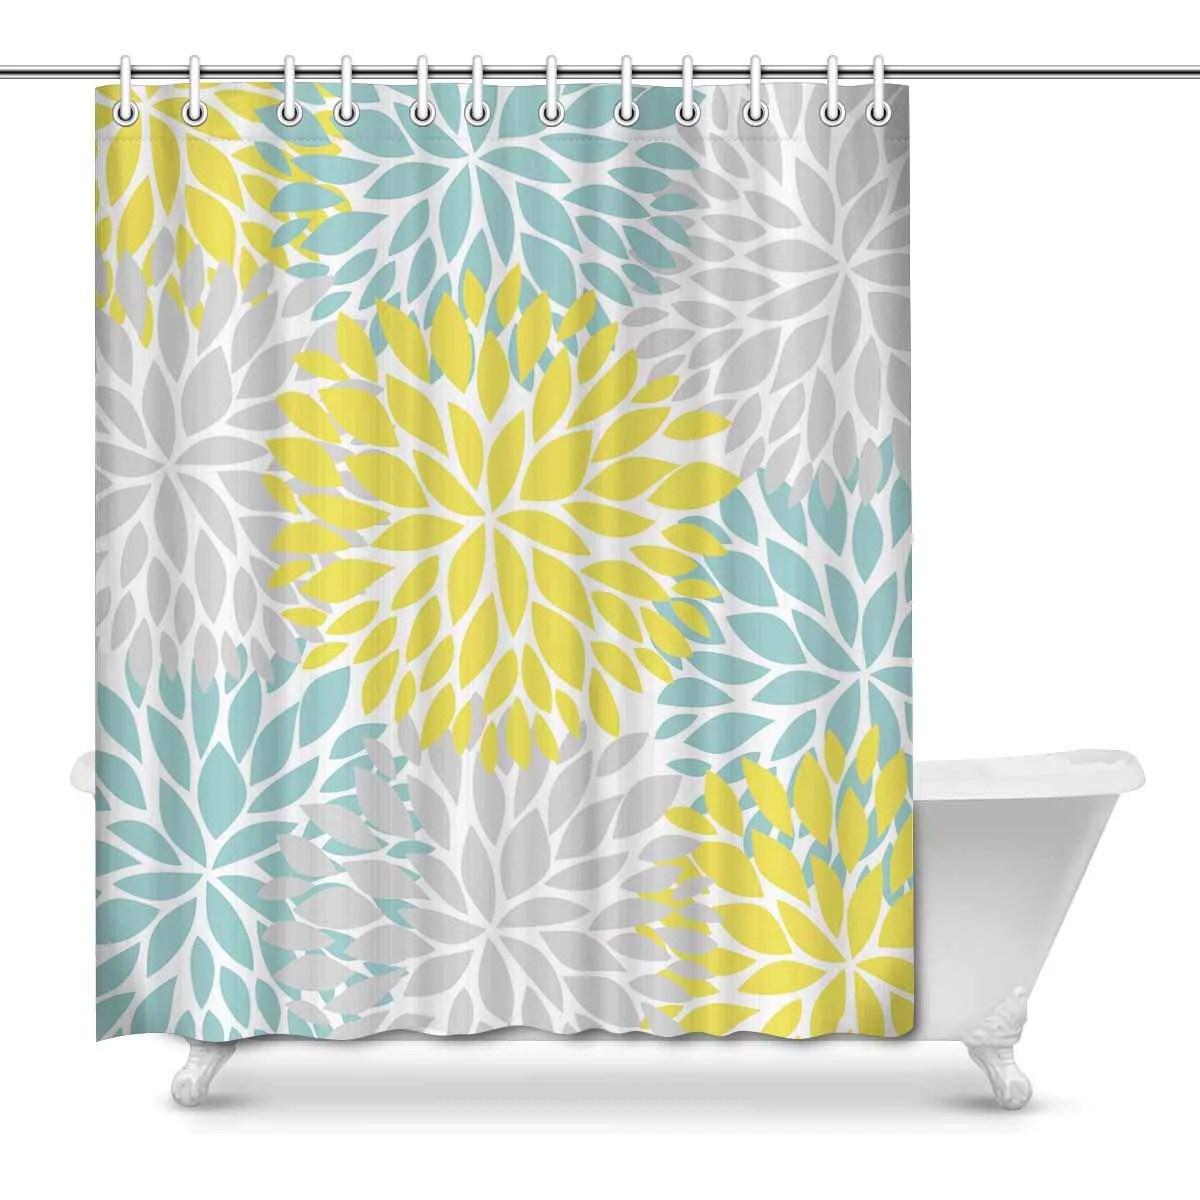 mkhert dahlia pinnata flower yellow light blue and gray decor waterproof polyester bathroom shower curtain bath decorations 66x72 inch